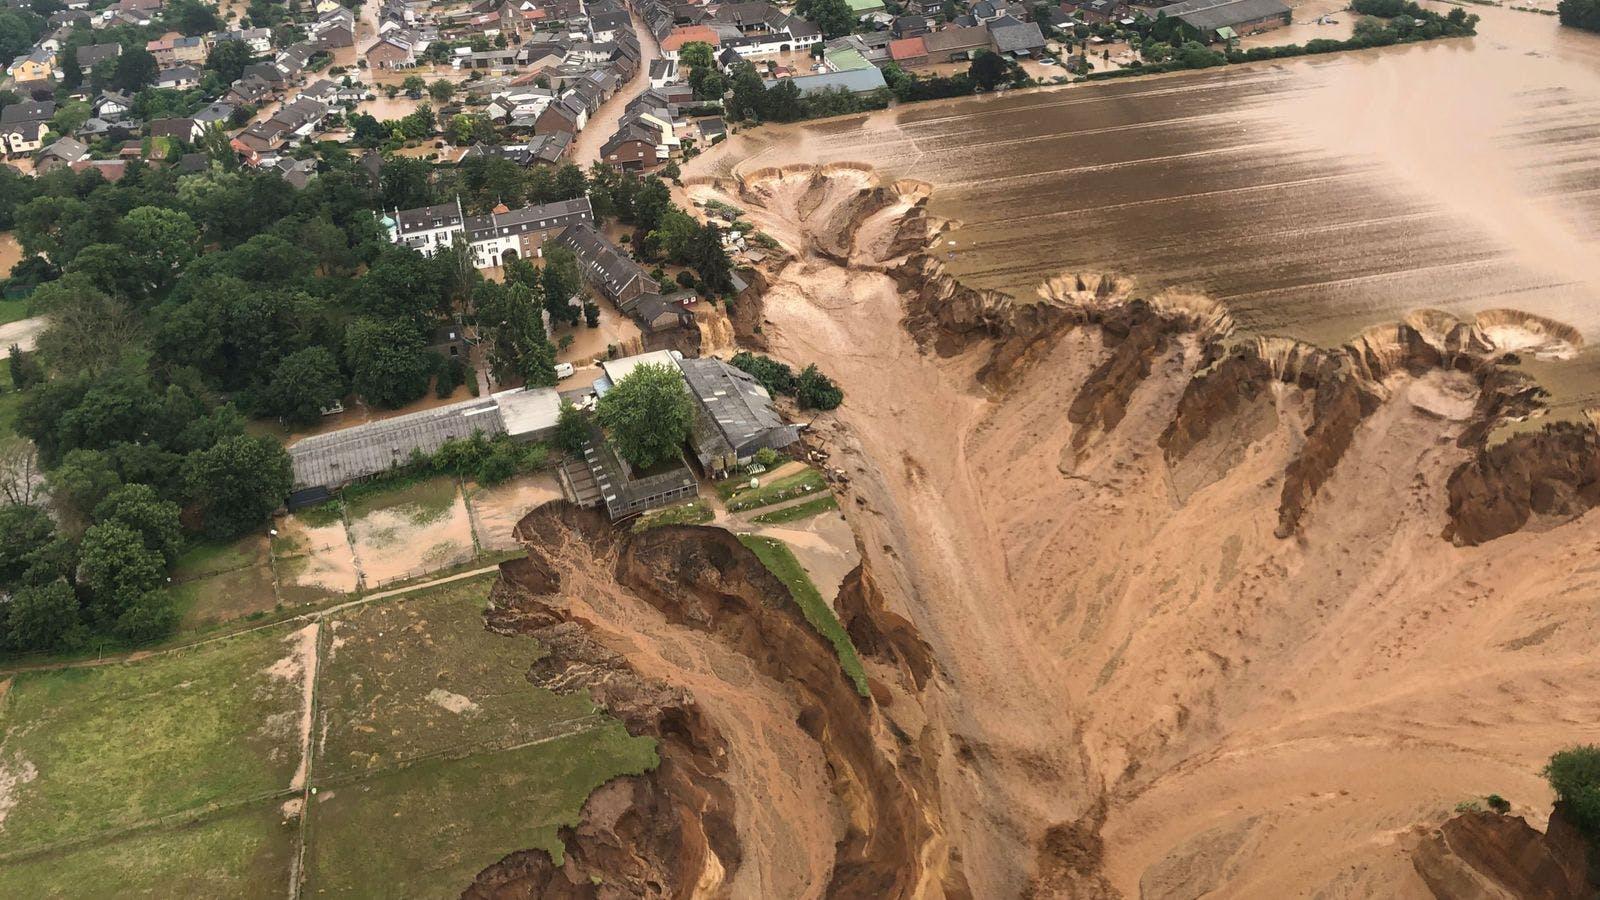 German Floods Leave at Least 100 Dead, 1,300 Missing